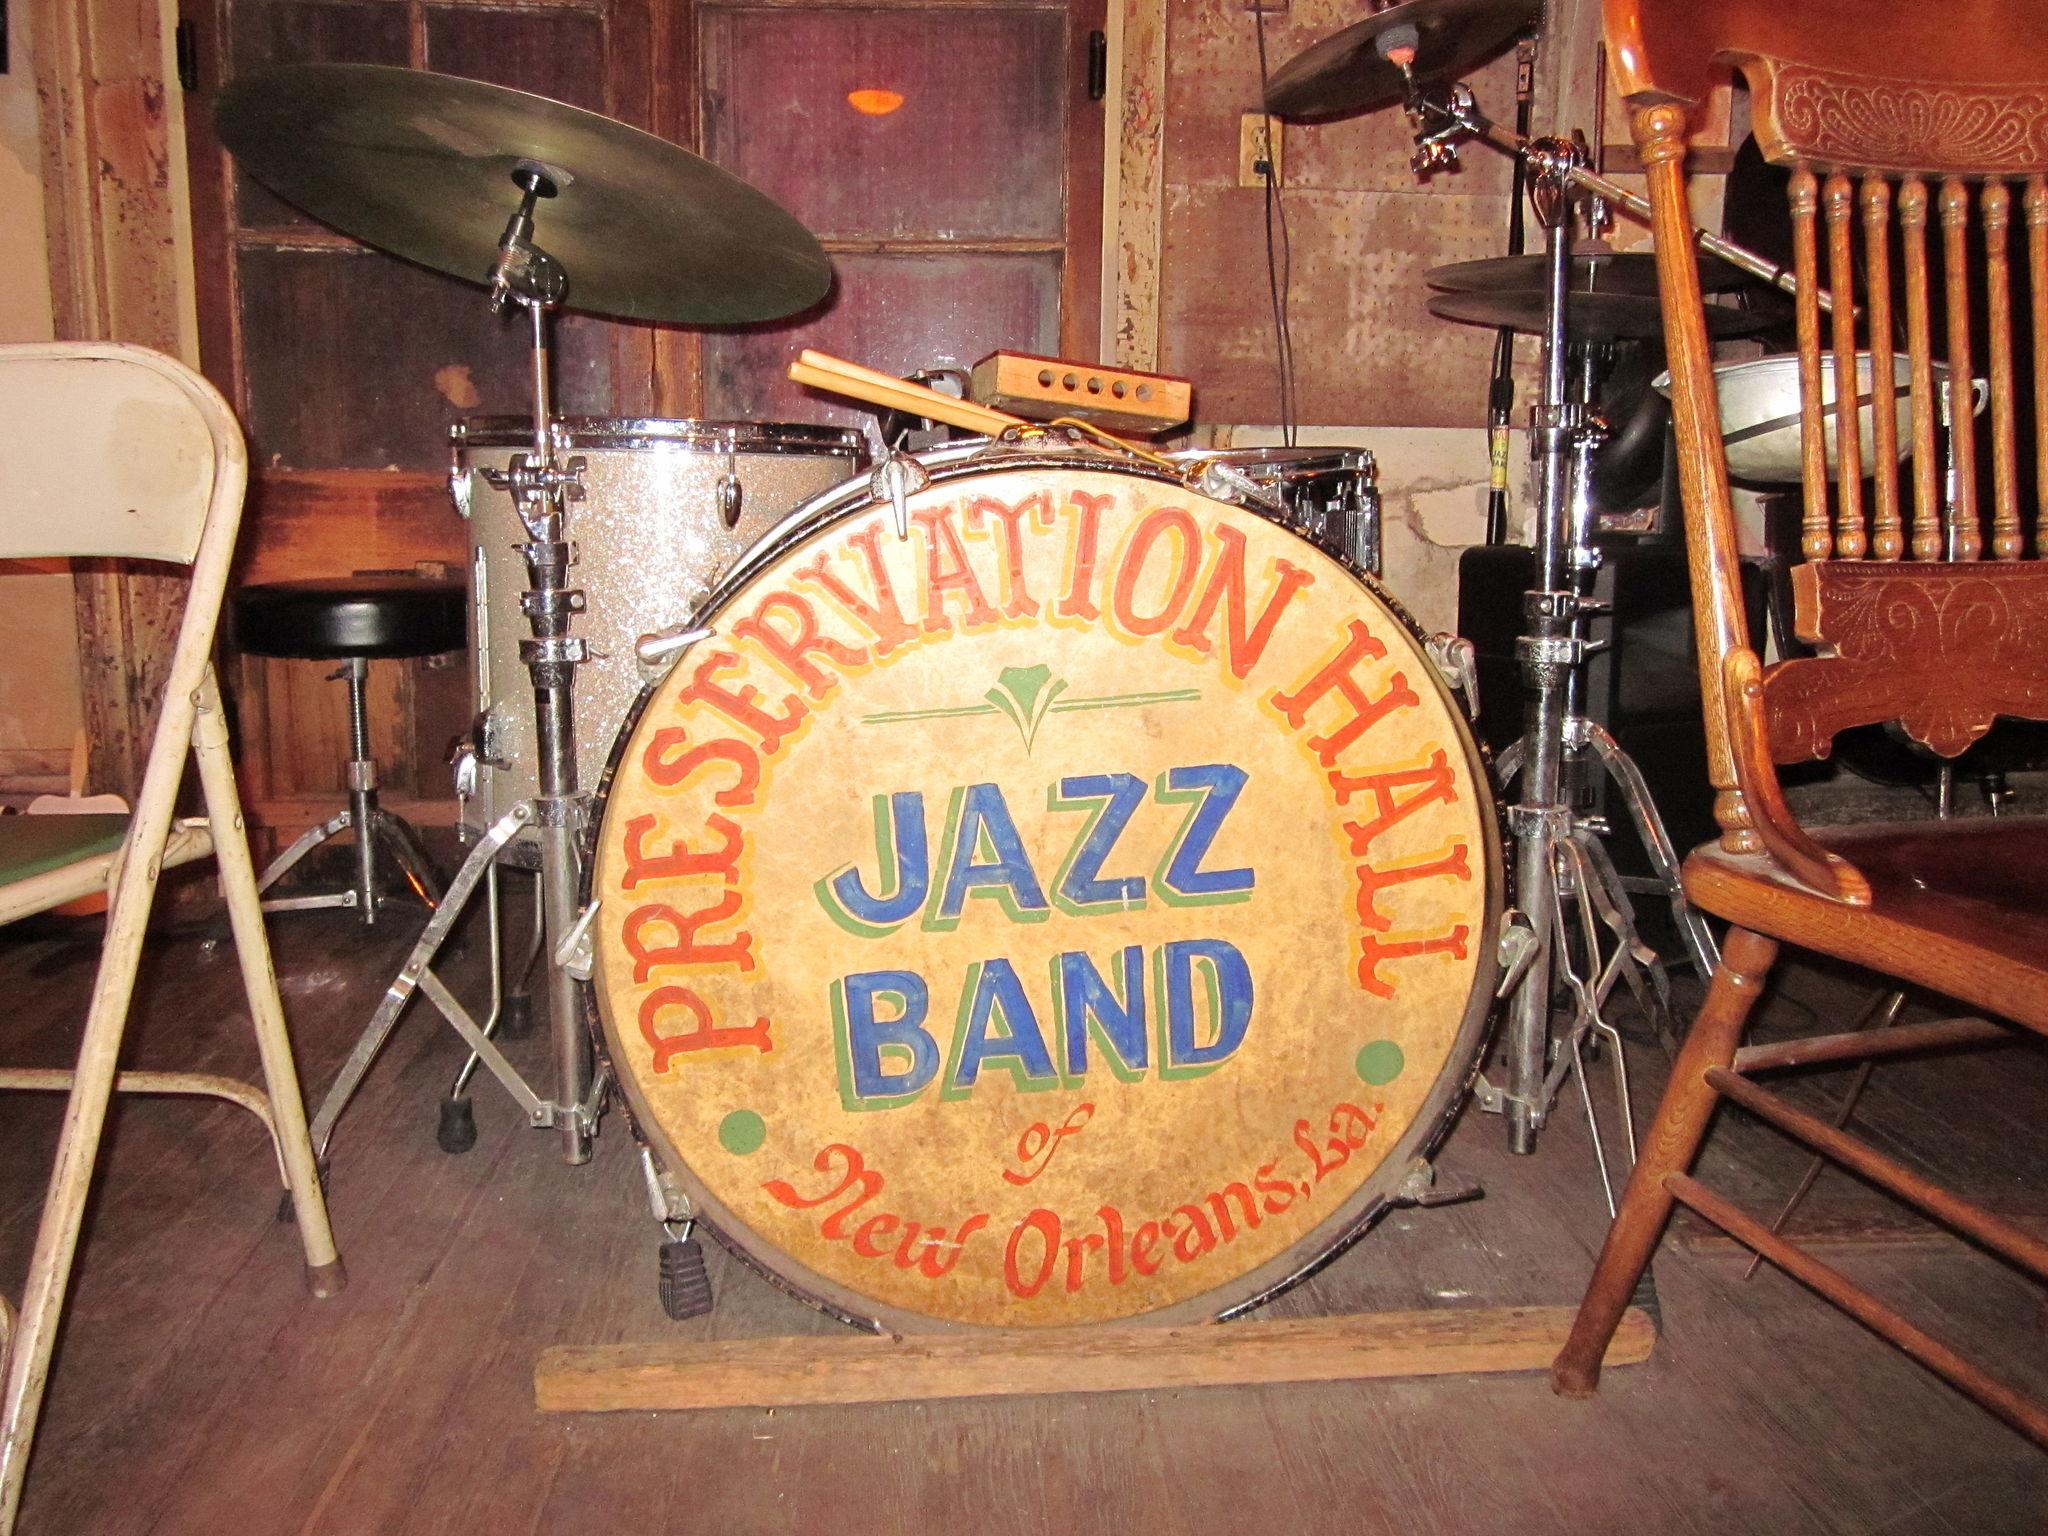 apollo drums history - photo #27